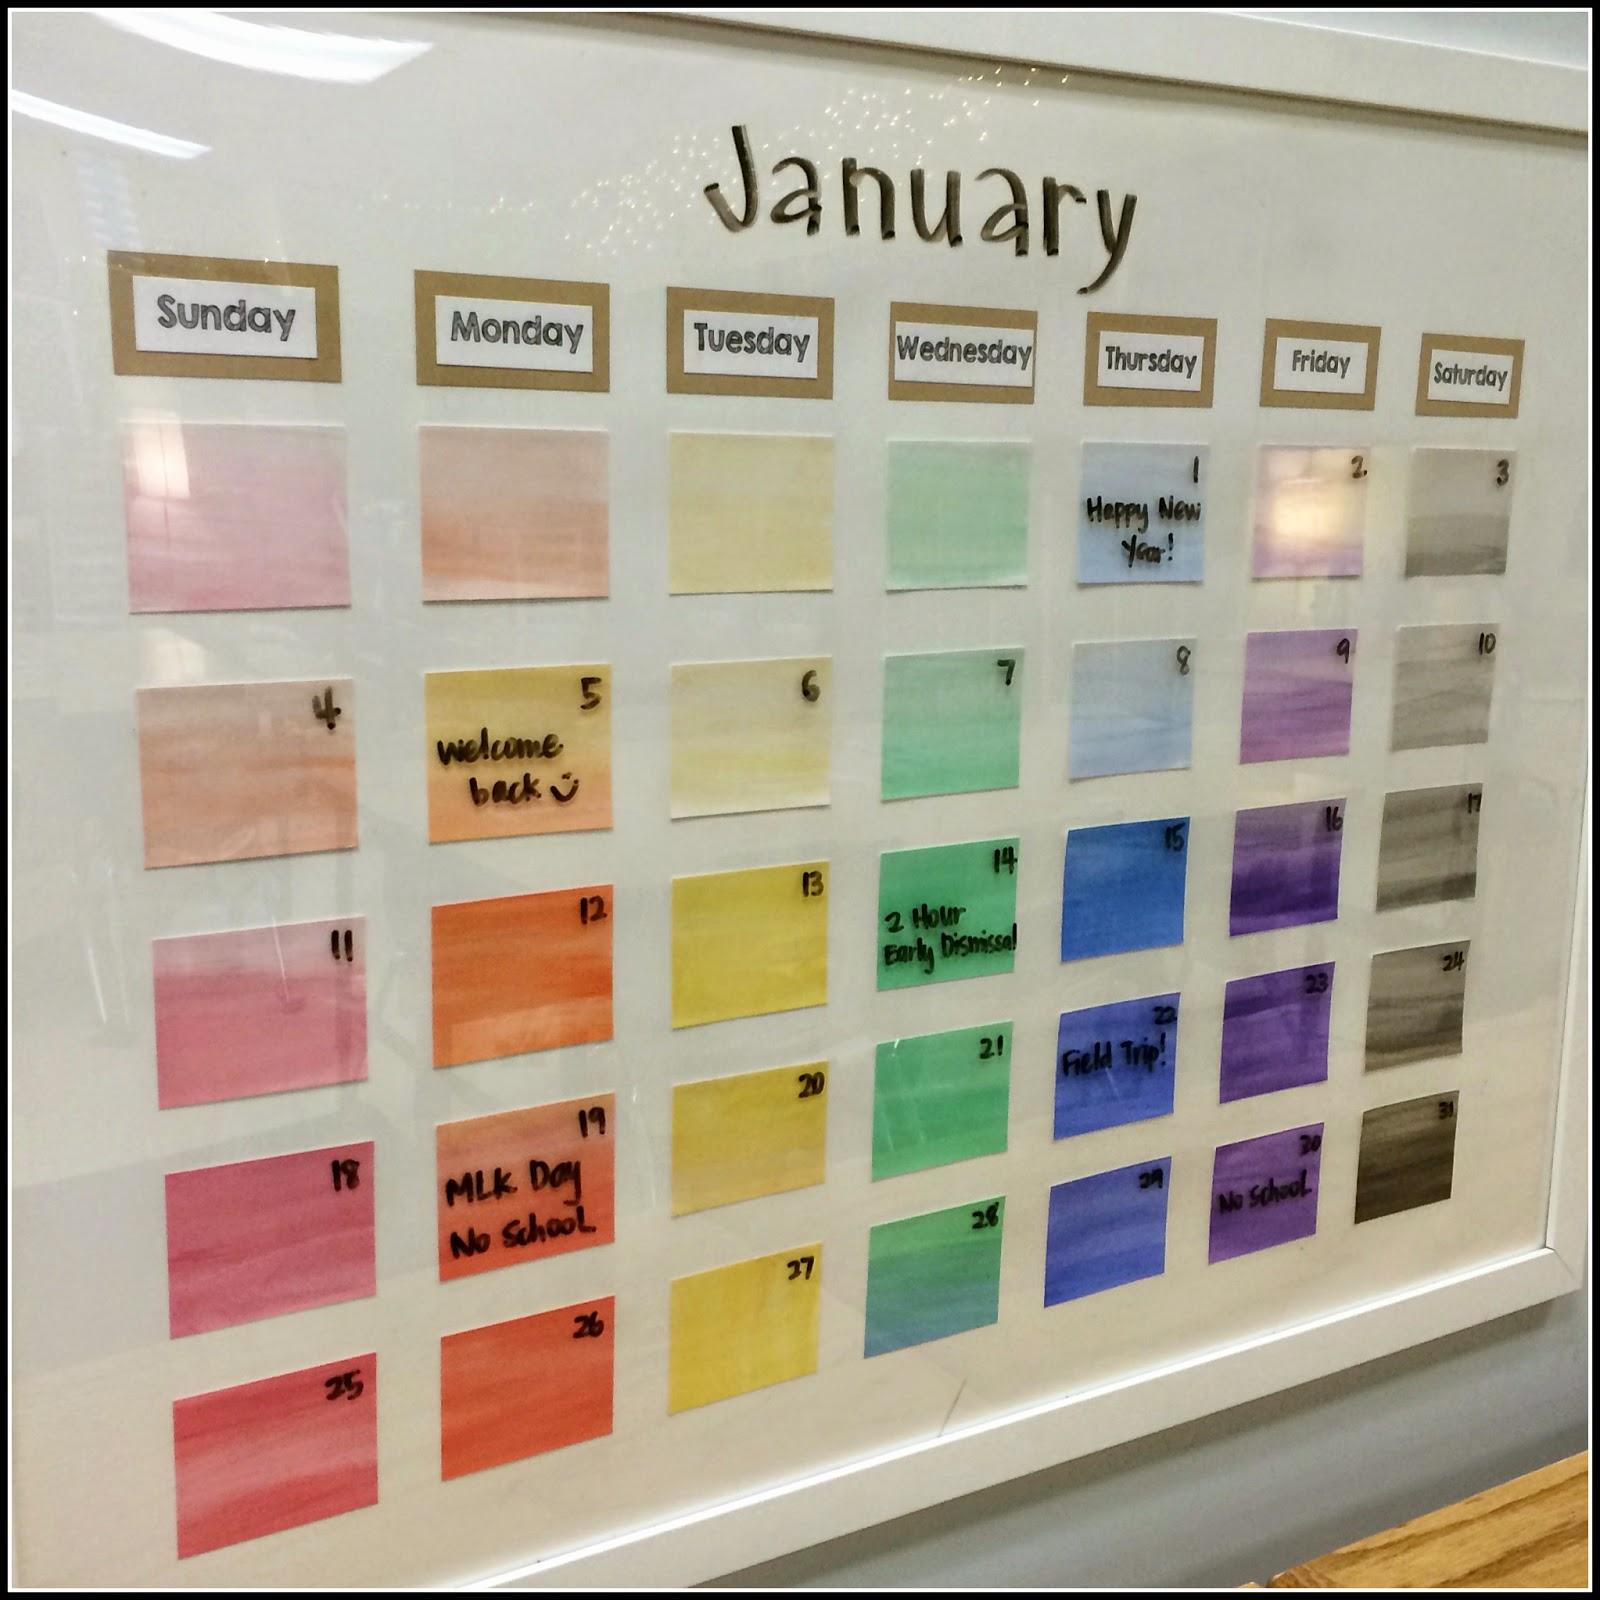 Classroom Calendar Ideas ~ Teacher classroom ideas and storage tips on pinterest